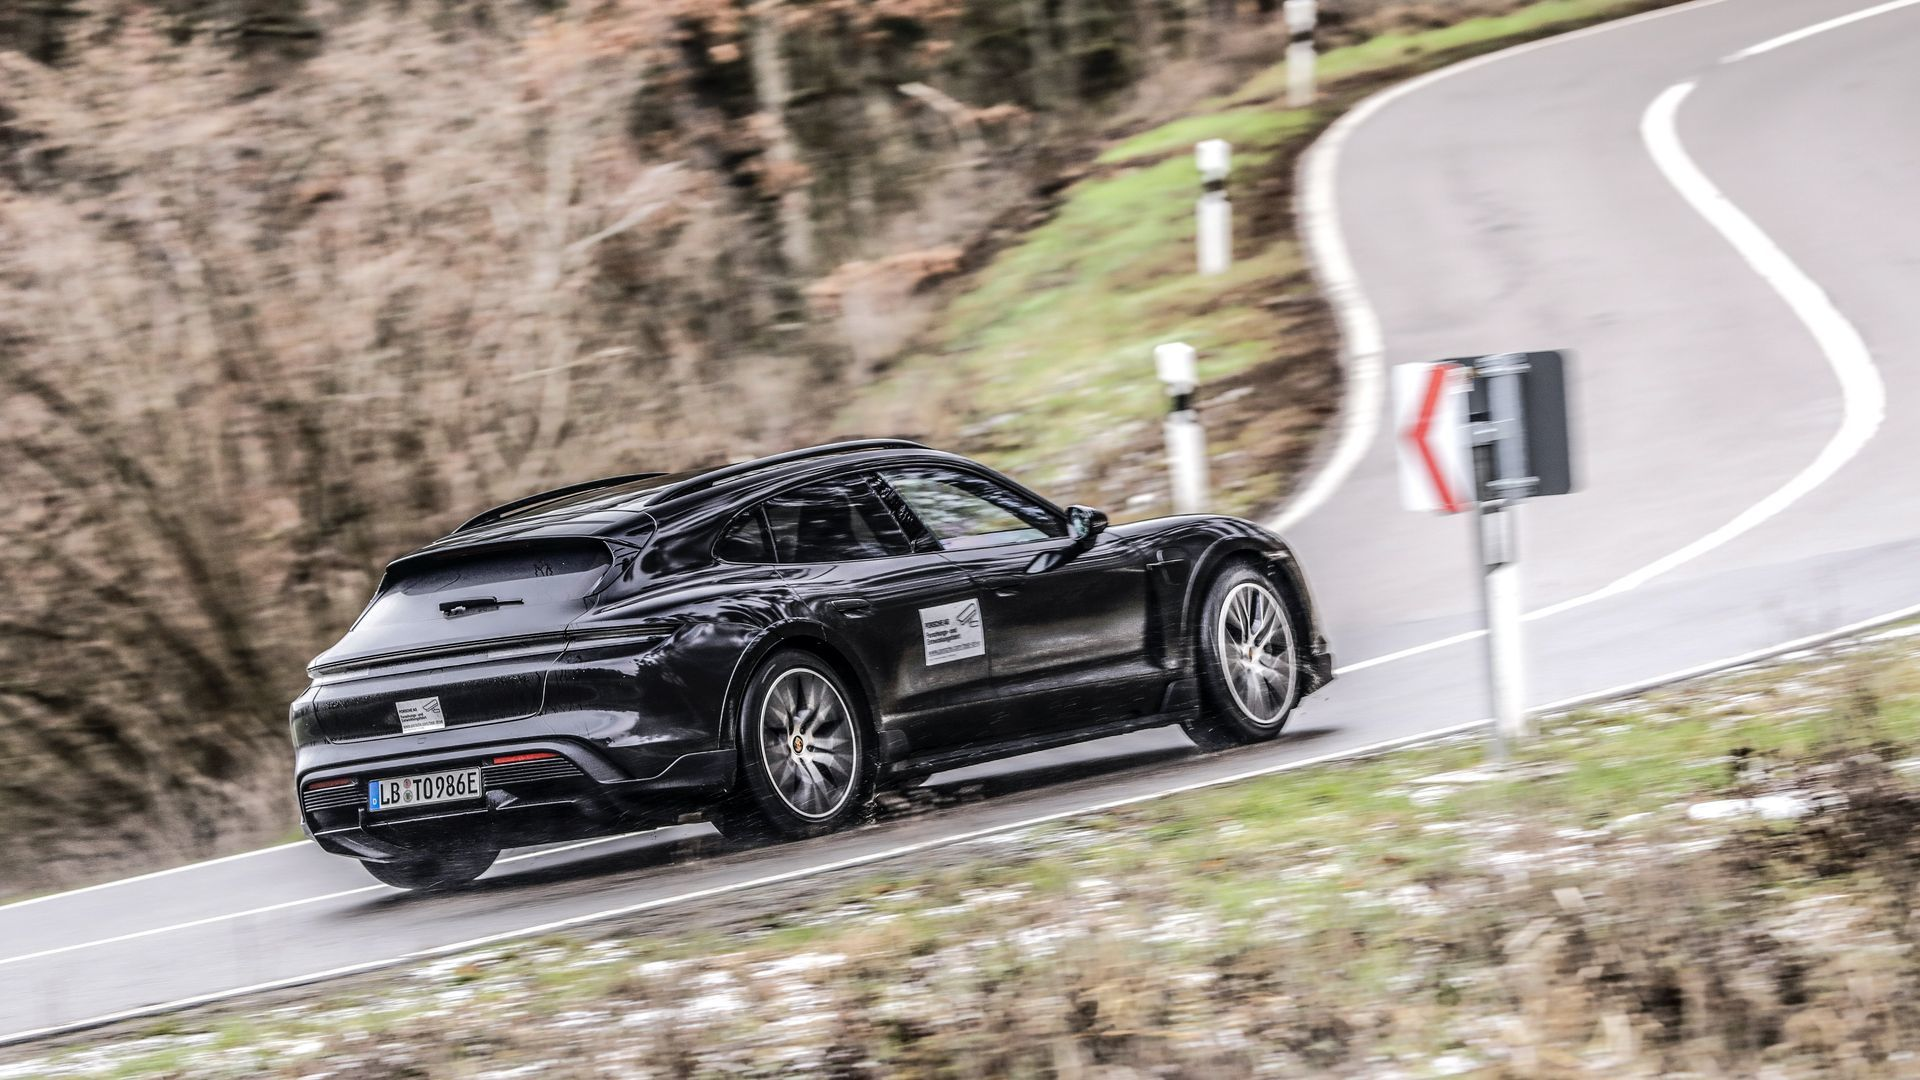 Porsche Taycan Cross Turismo Pruebas 7